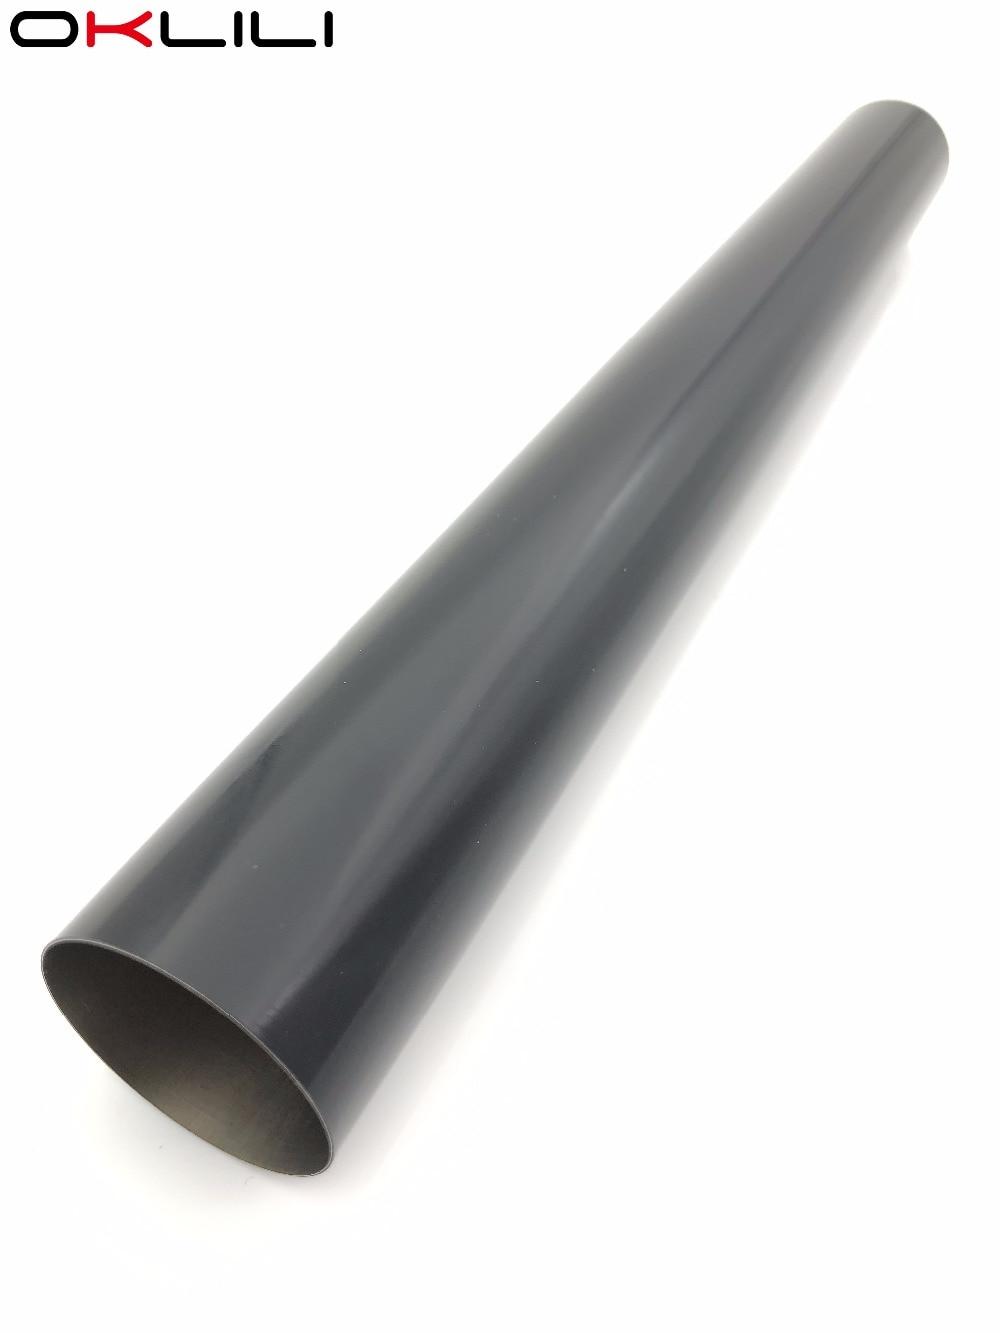 1X JAPAN 302RV93050 2RV93050 FK-1150 Fuser Fixing Film Sleeve For Kyocera ECOSYS P2040 P2235 M2040 M2135 M2540 M2635 M2640 M2735